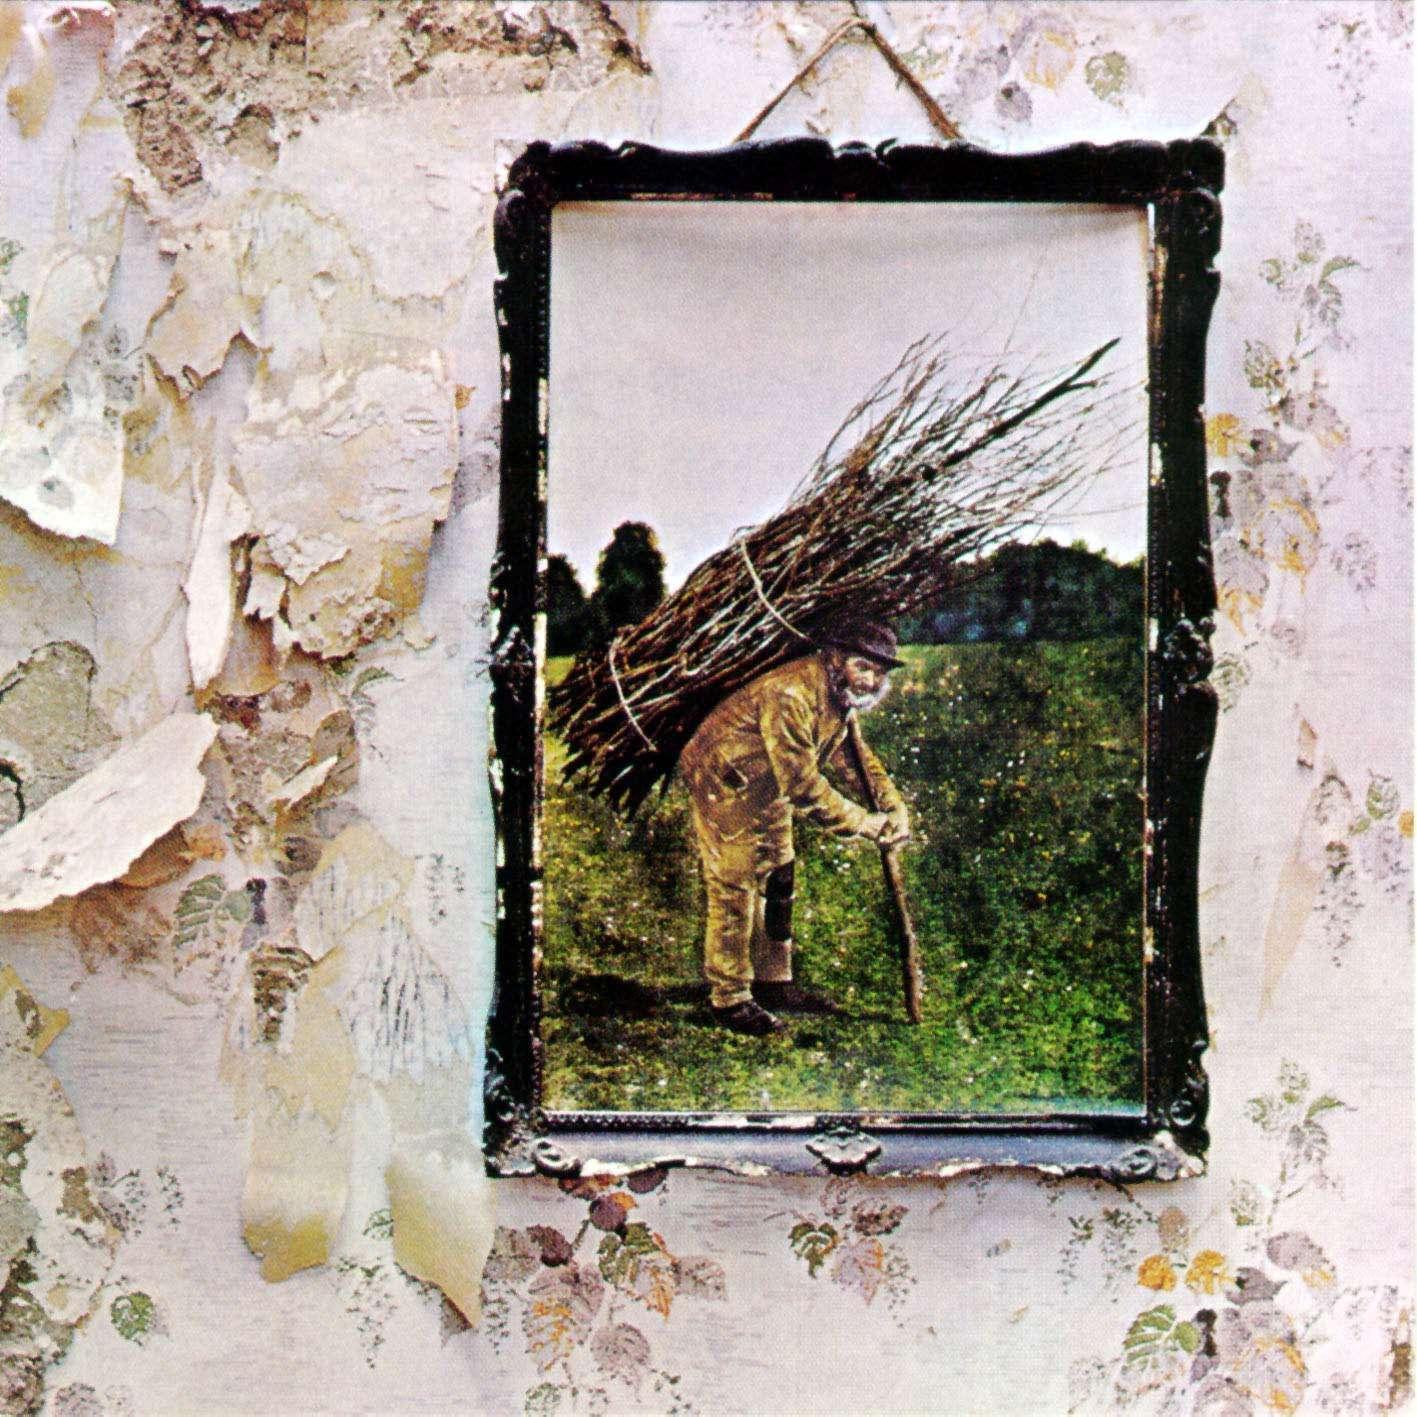 http://2.bp.blogspot.com/-yqNDC3IZigU/Triz6FHqbnI/AAAAAAAALfE/F9Ggl__kQHE/s1600/Led+Zeppelin+IV.jpg